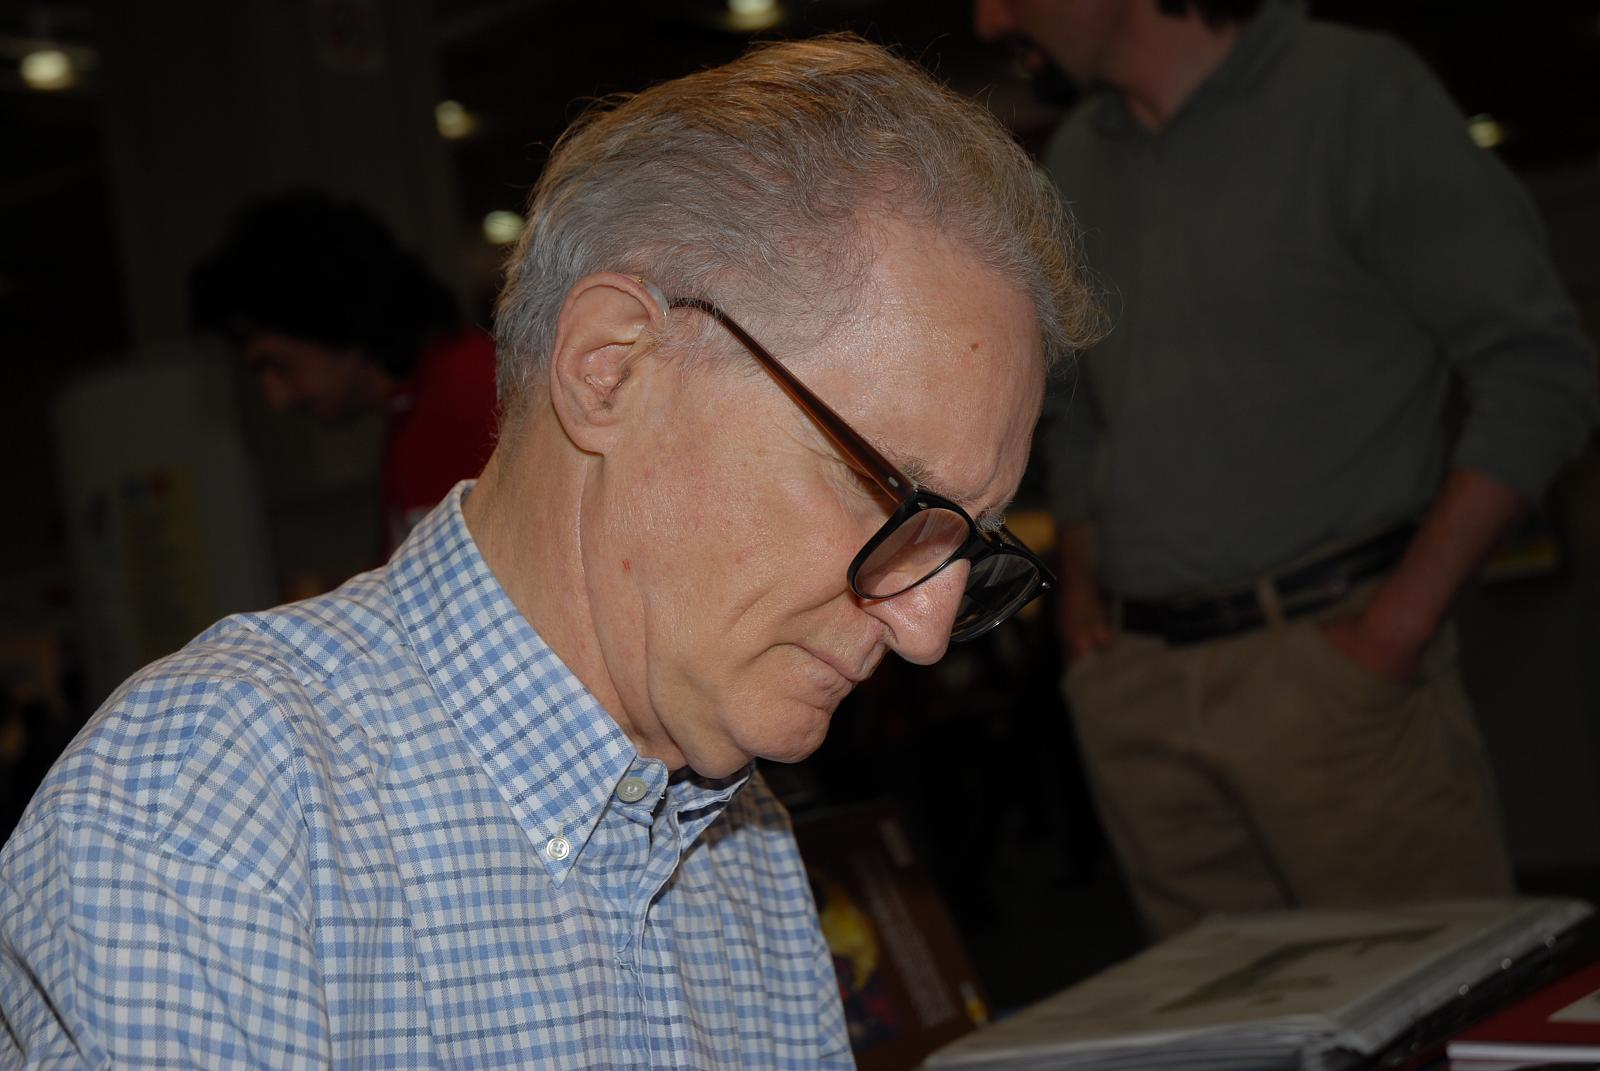 Sergio Toppi 1932-2012